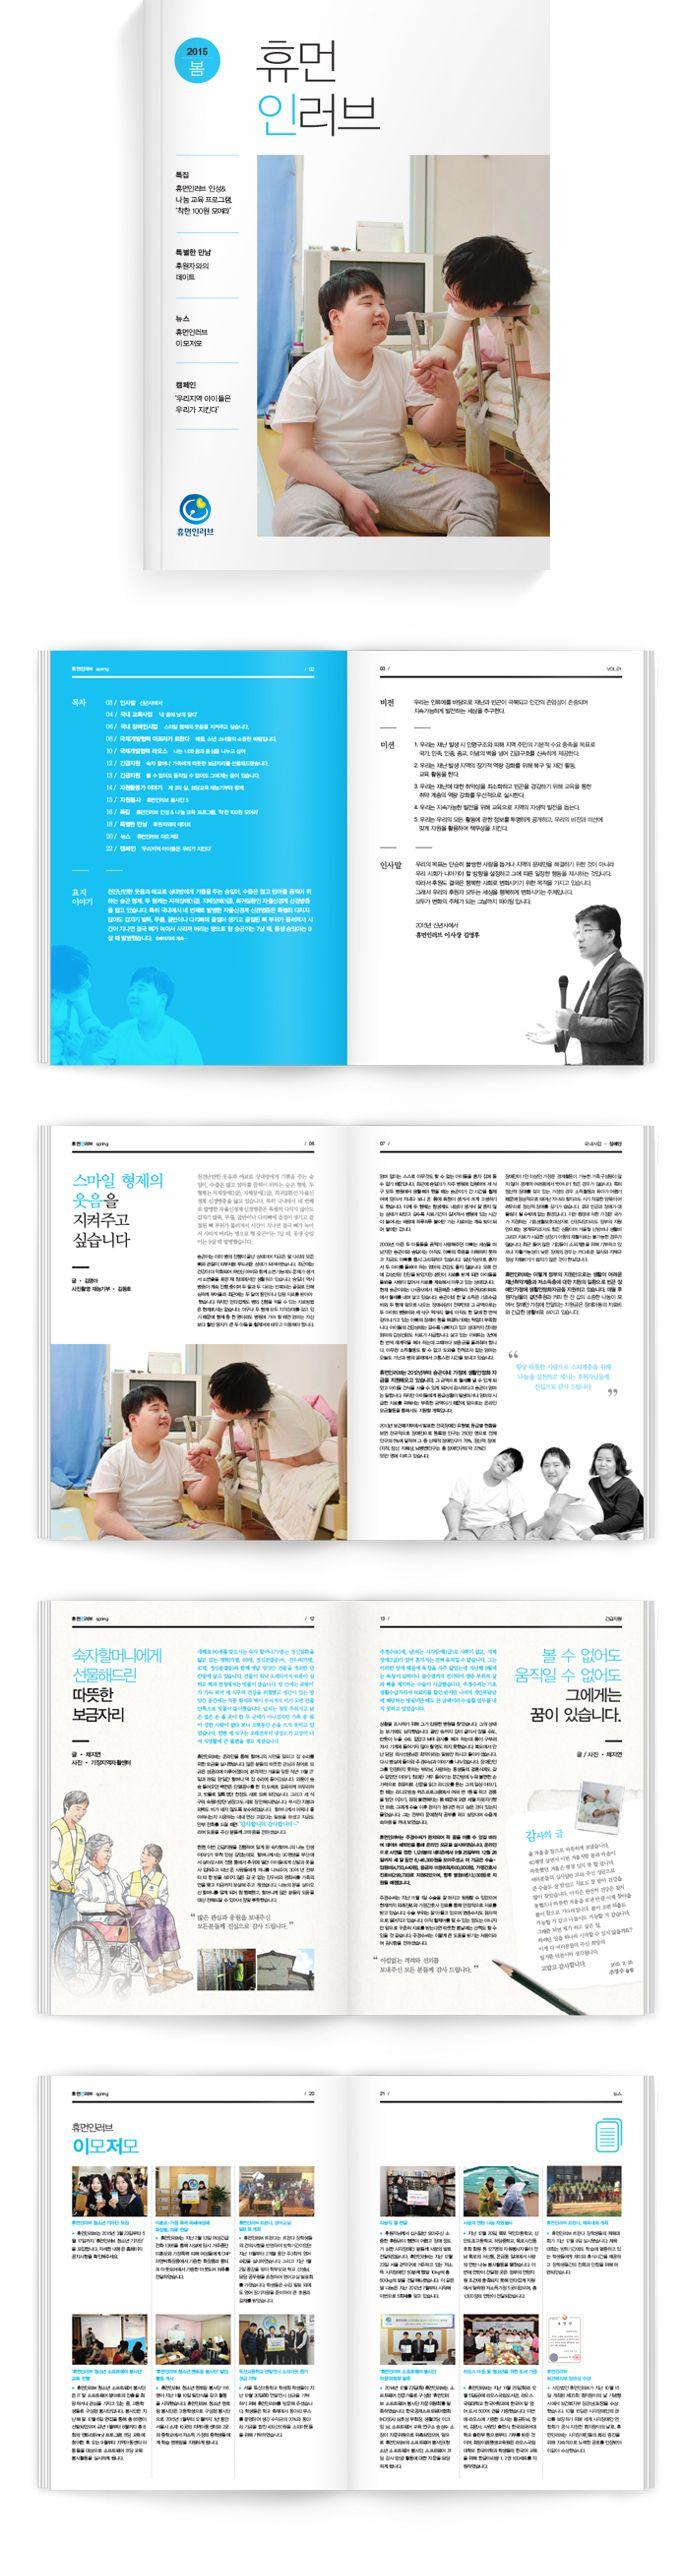 SUNNYISLAND - 휴먼인러브 정기간행물